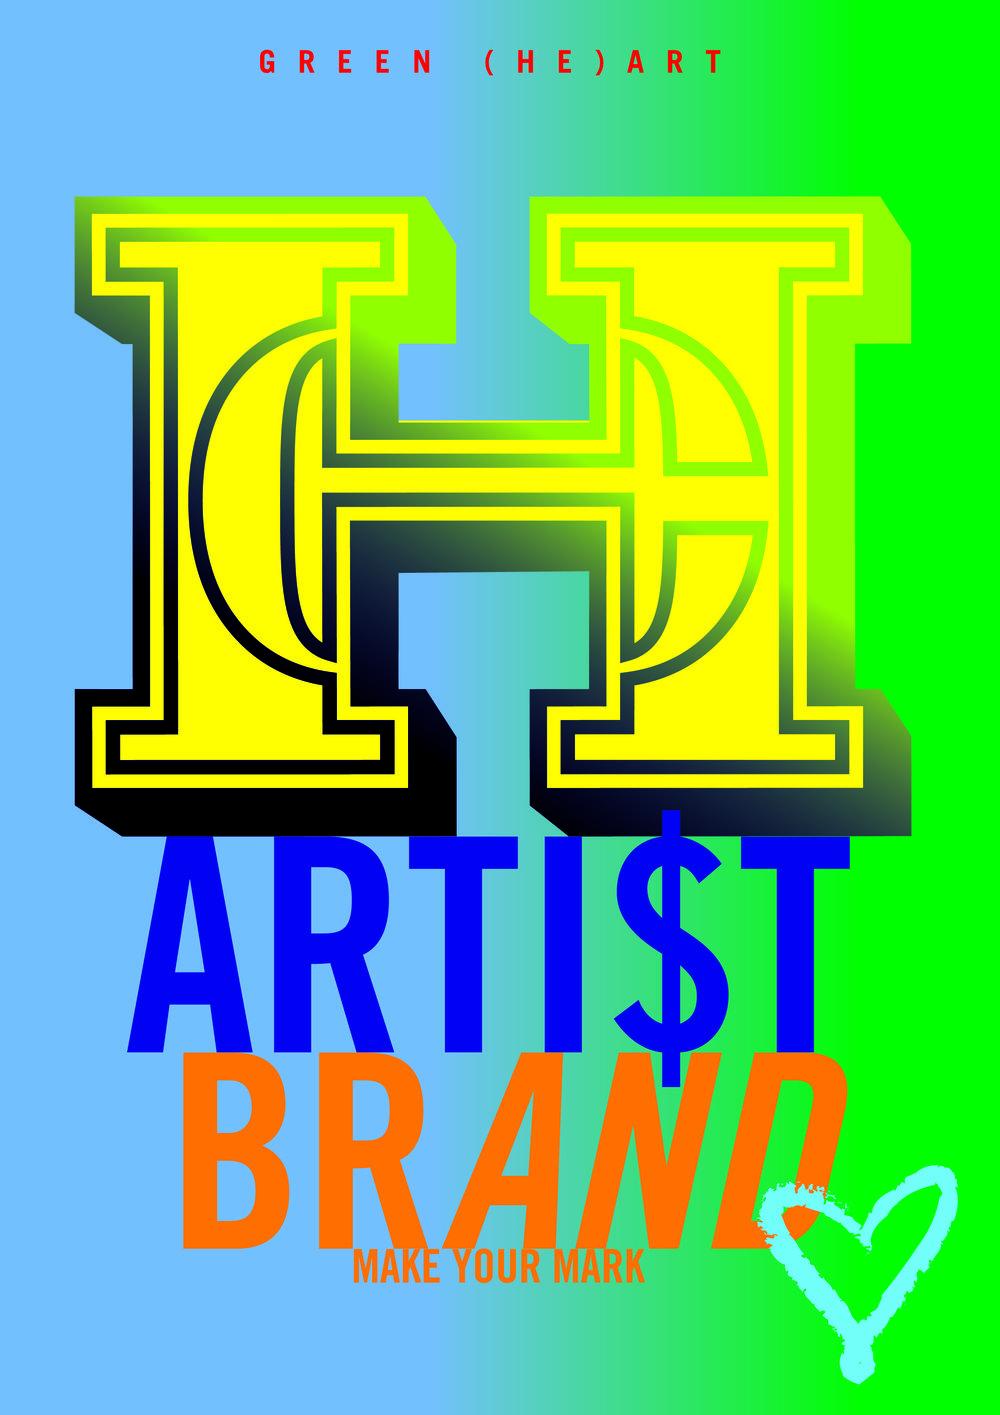 artist.brand.jpg